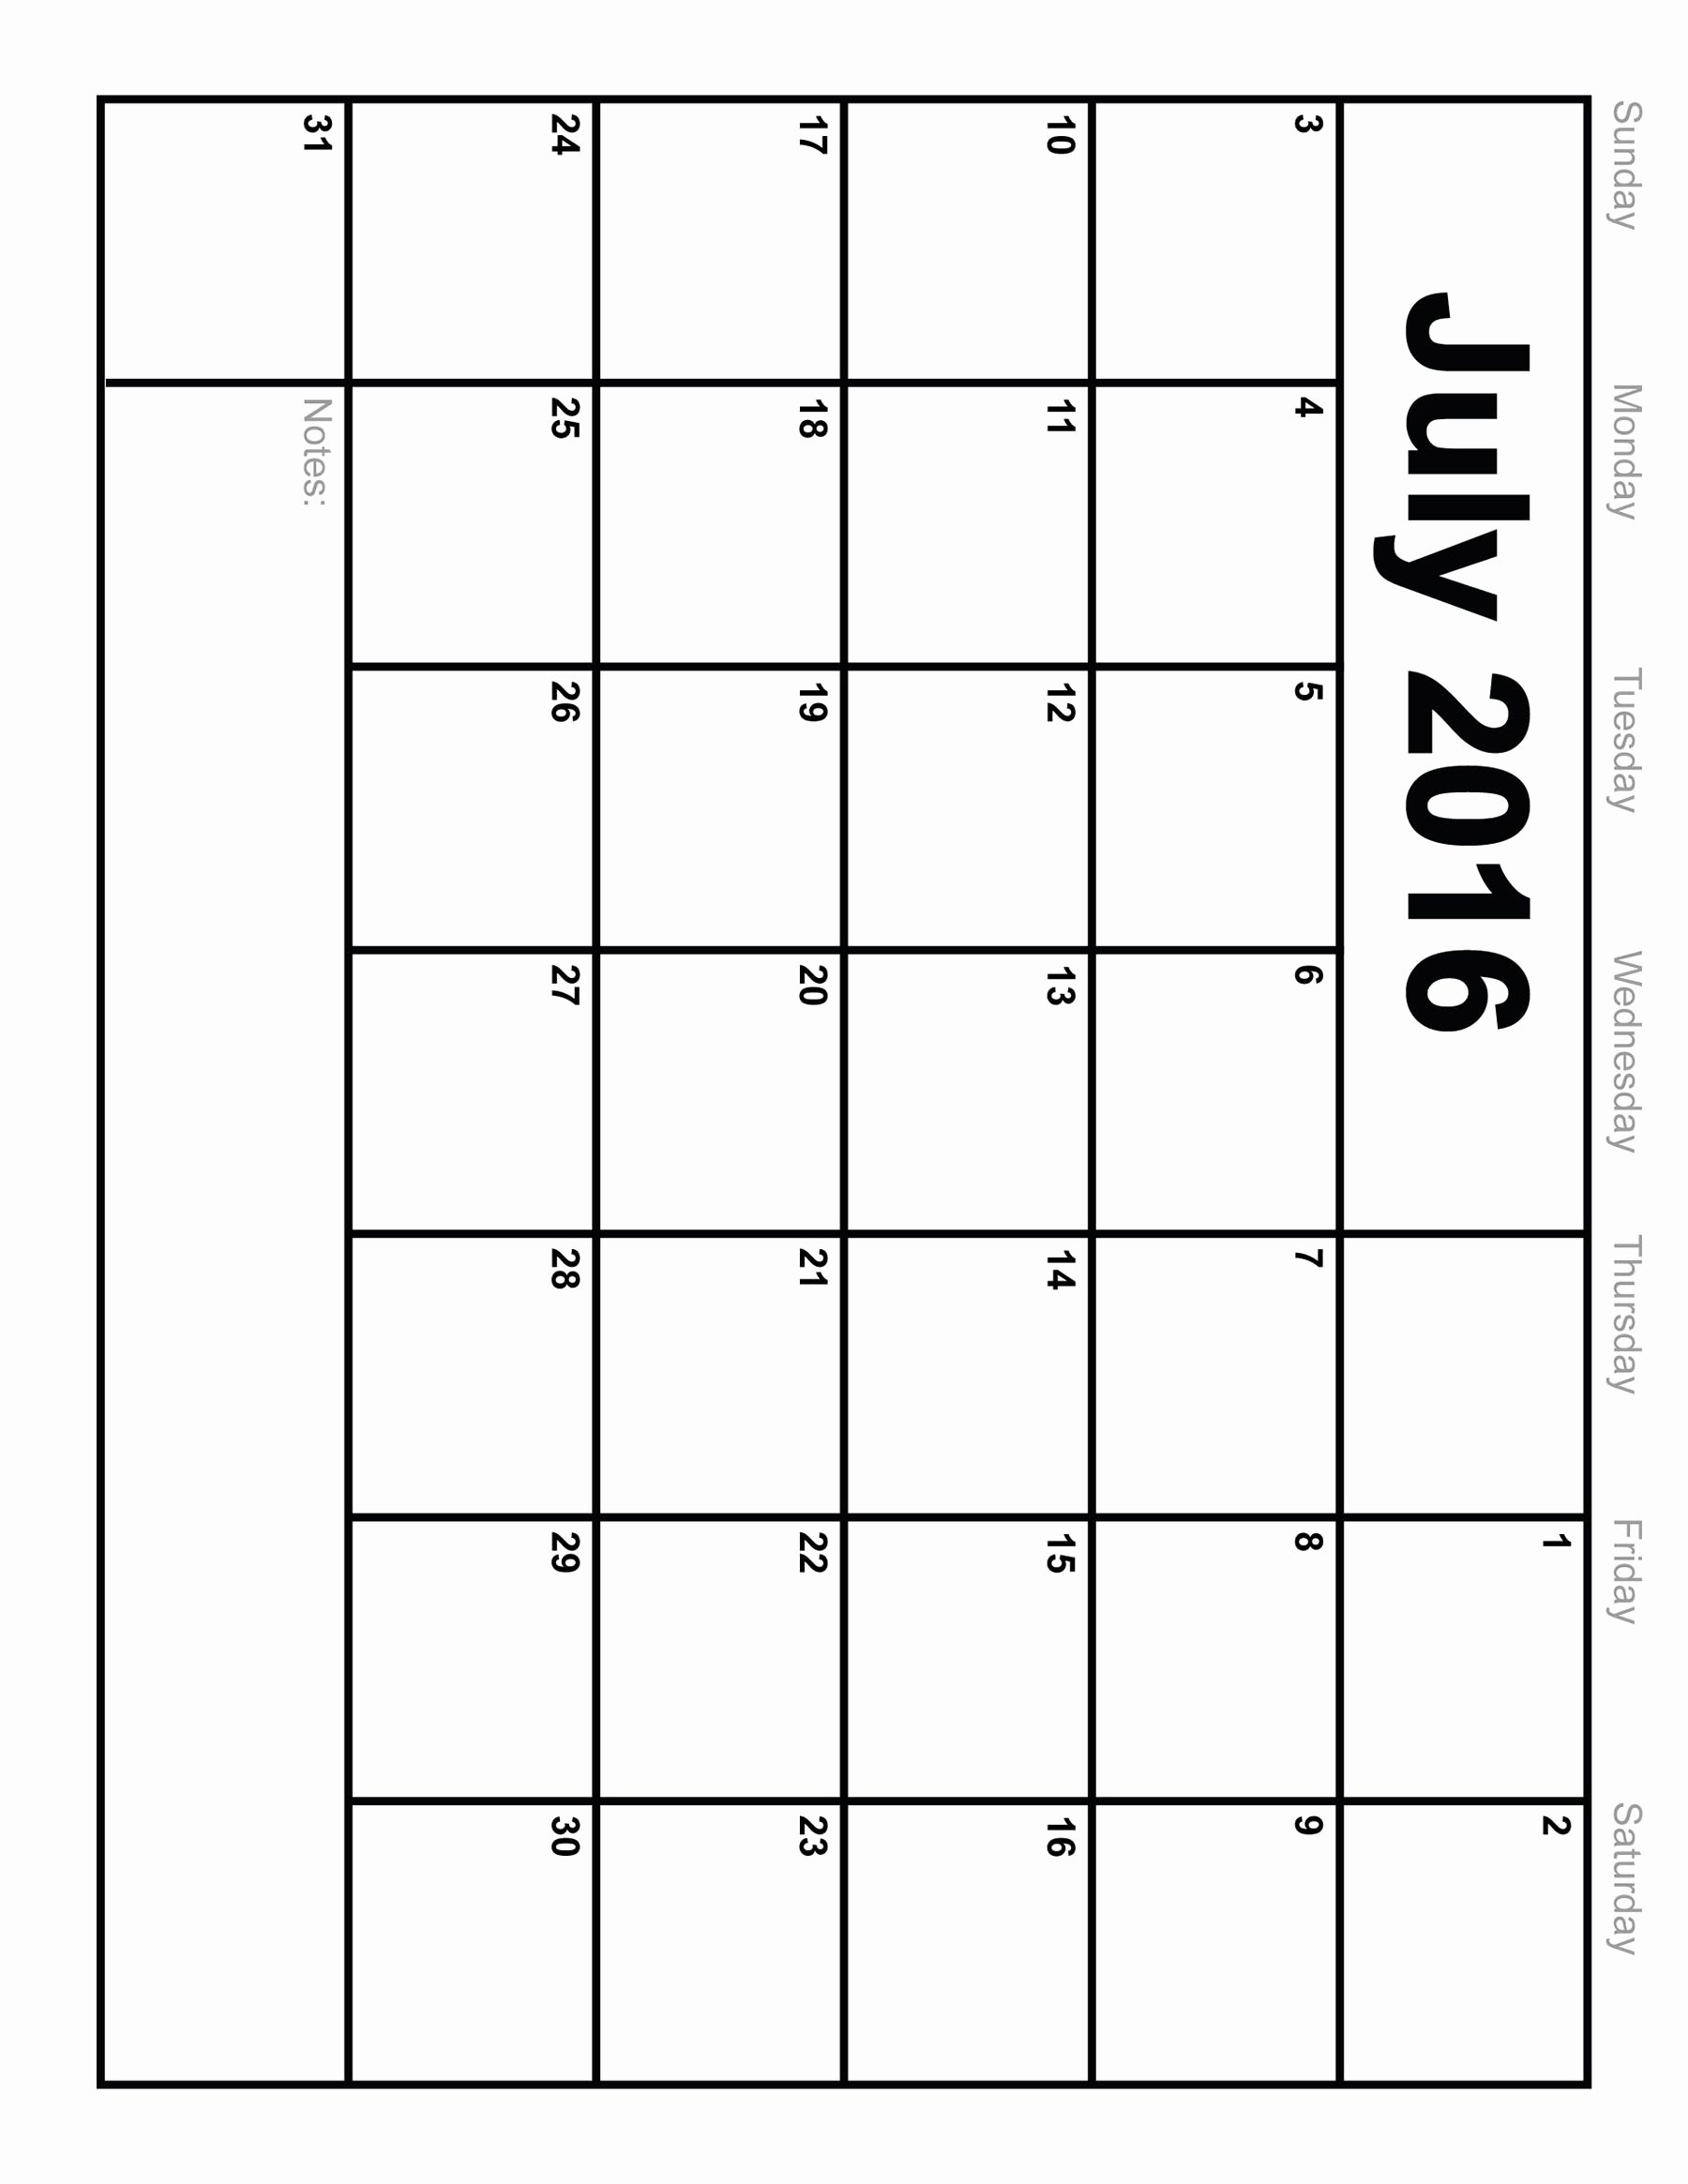 Printable Blank July 2016 Calendar Template